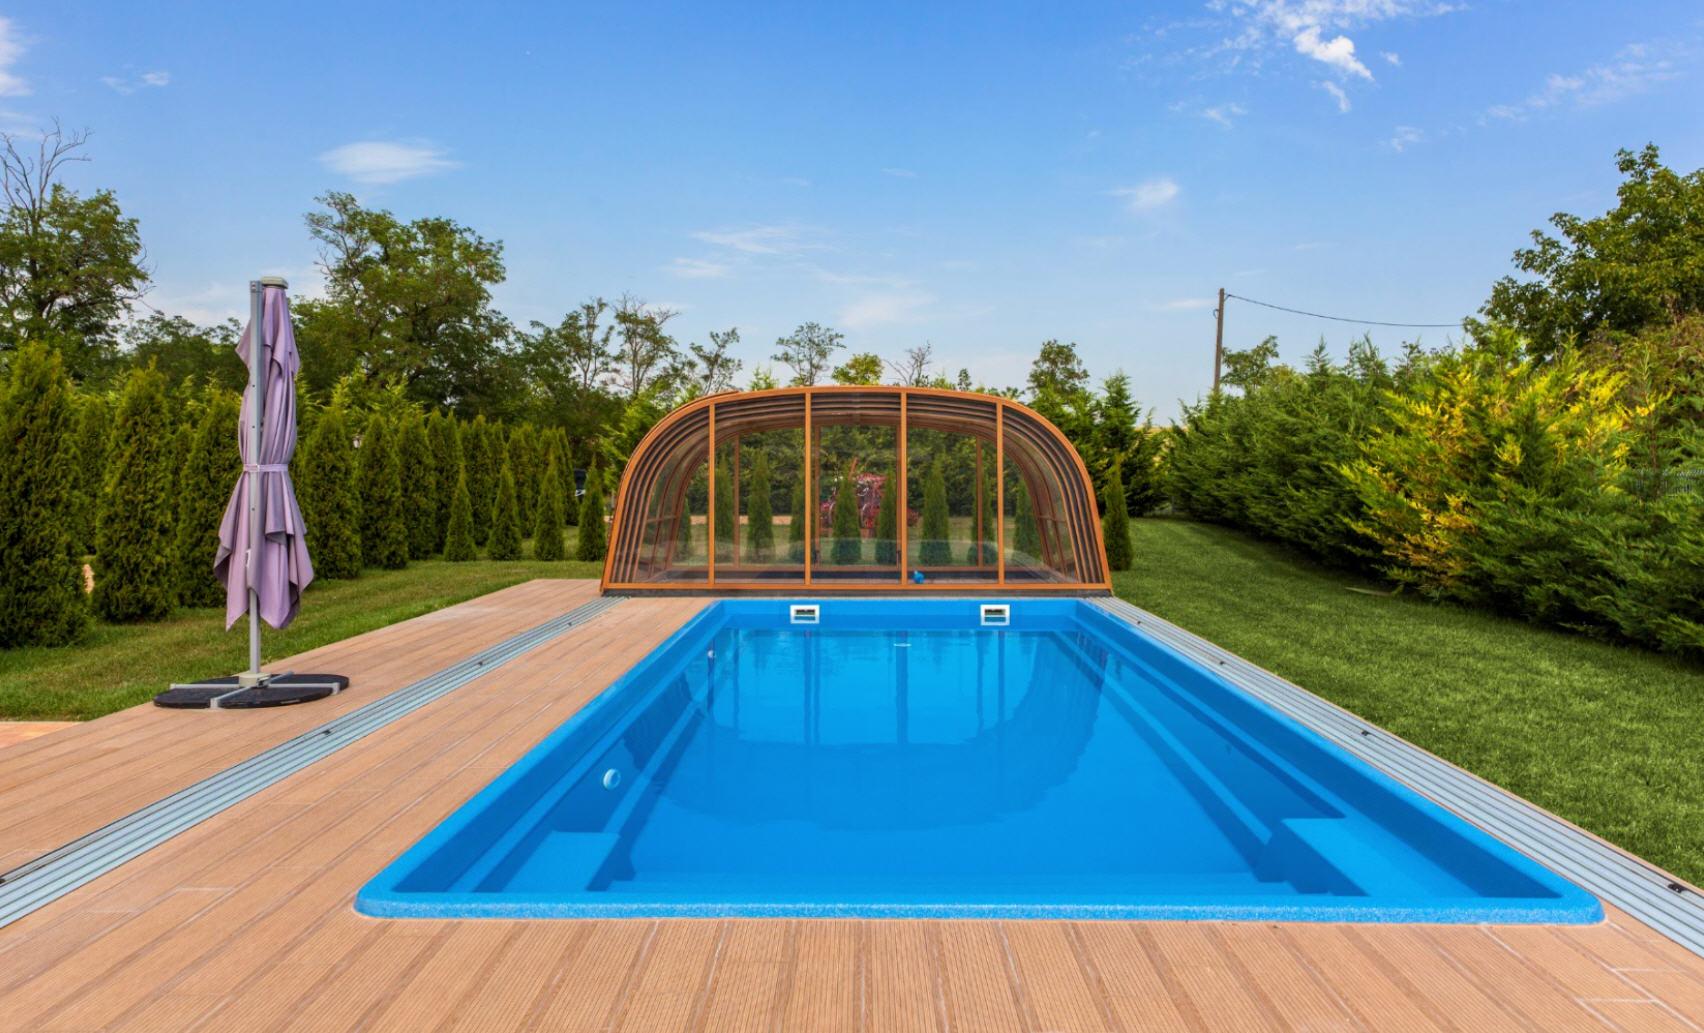 Galaxy-high-telescopic-pool-enclosure-02